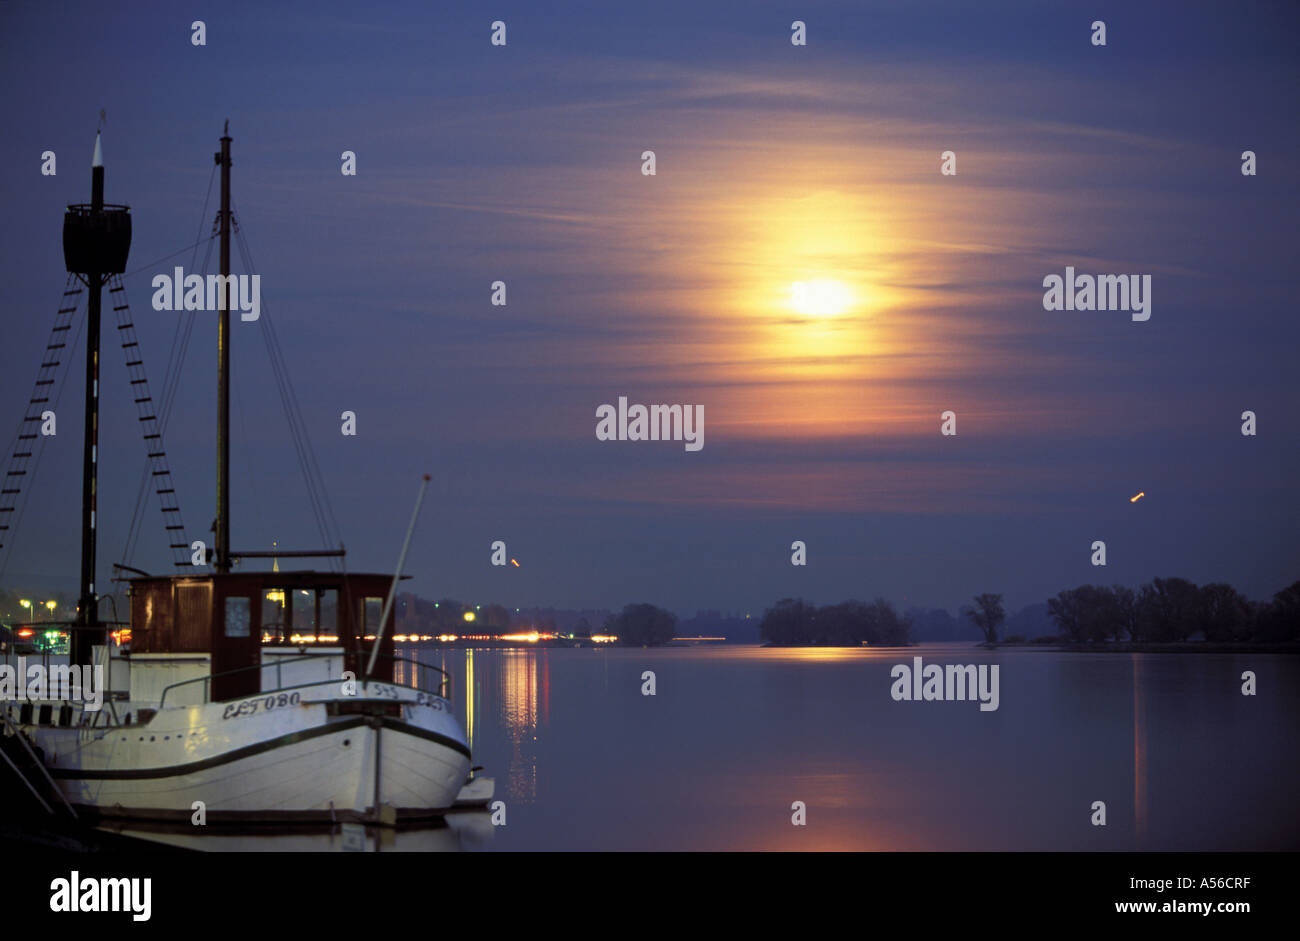 Rheingau /Geisenheim, Rhine River, Full moon on the river - Stock Image